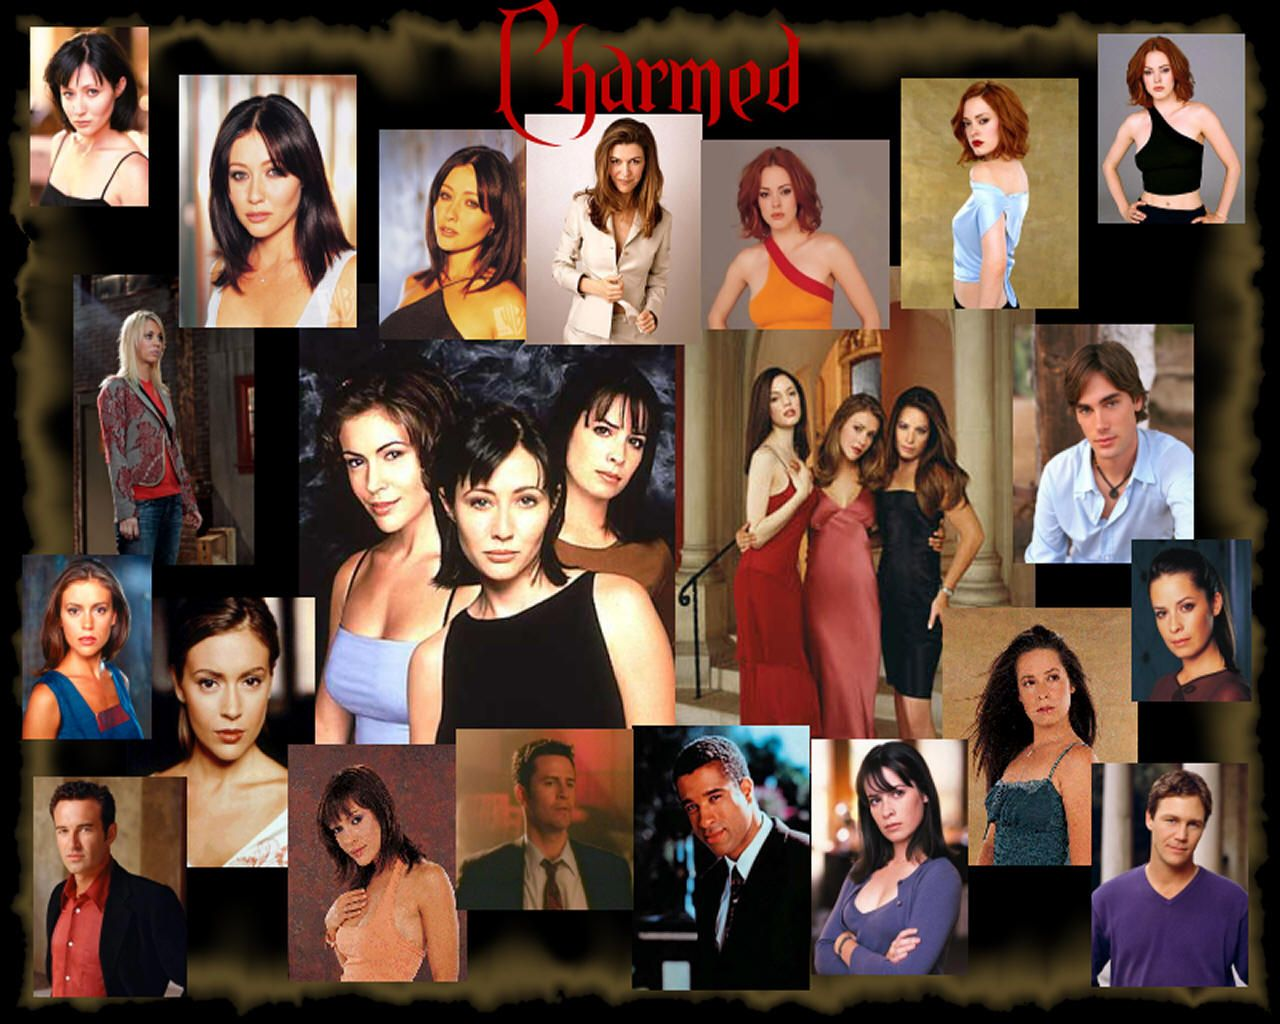 charmed tv series people - photo #25